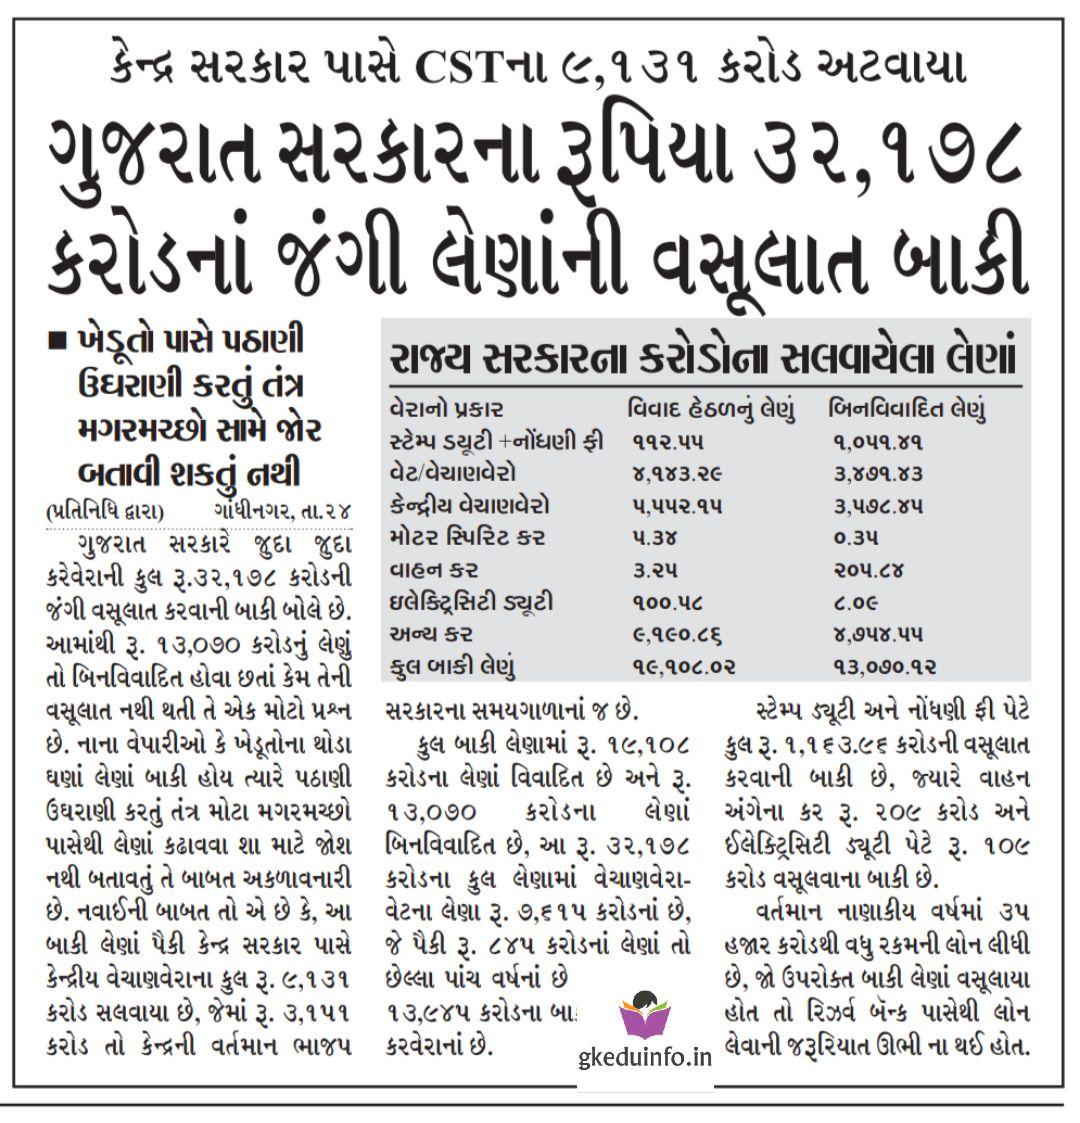 EDUCATIONAL News Date 25/2/18